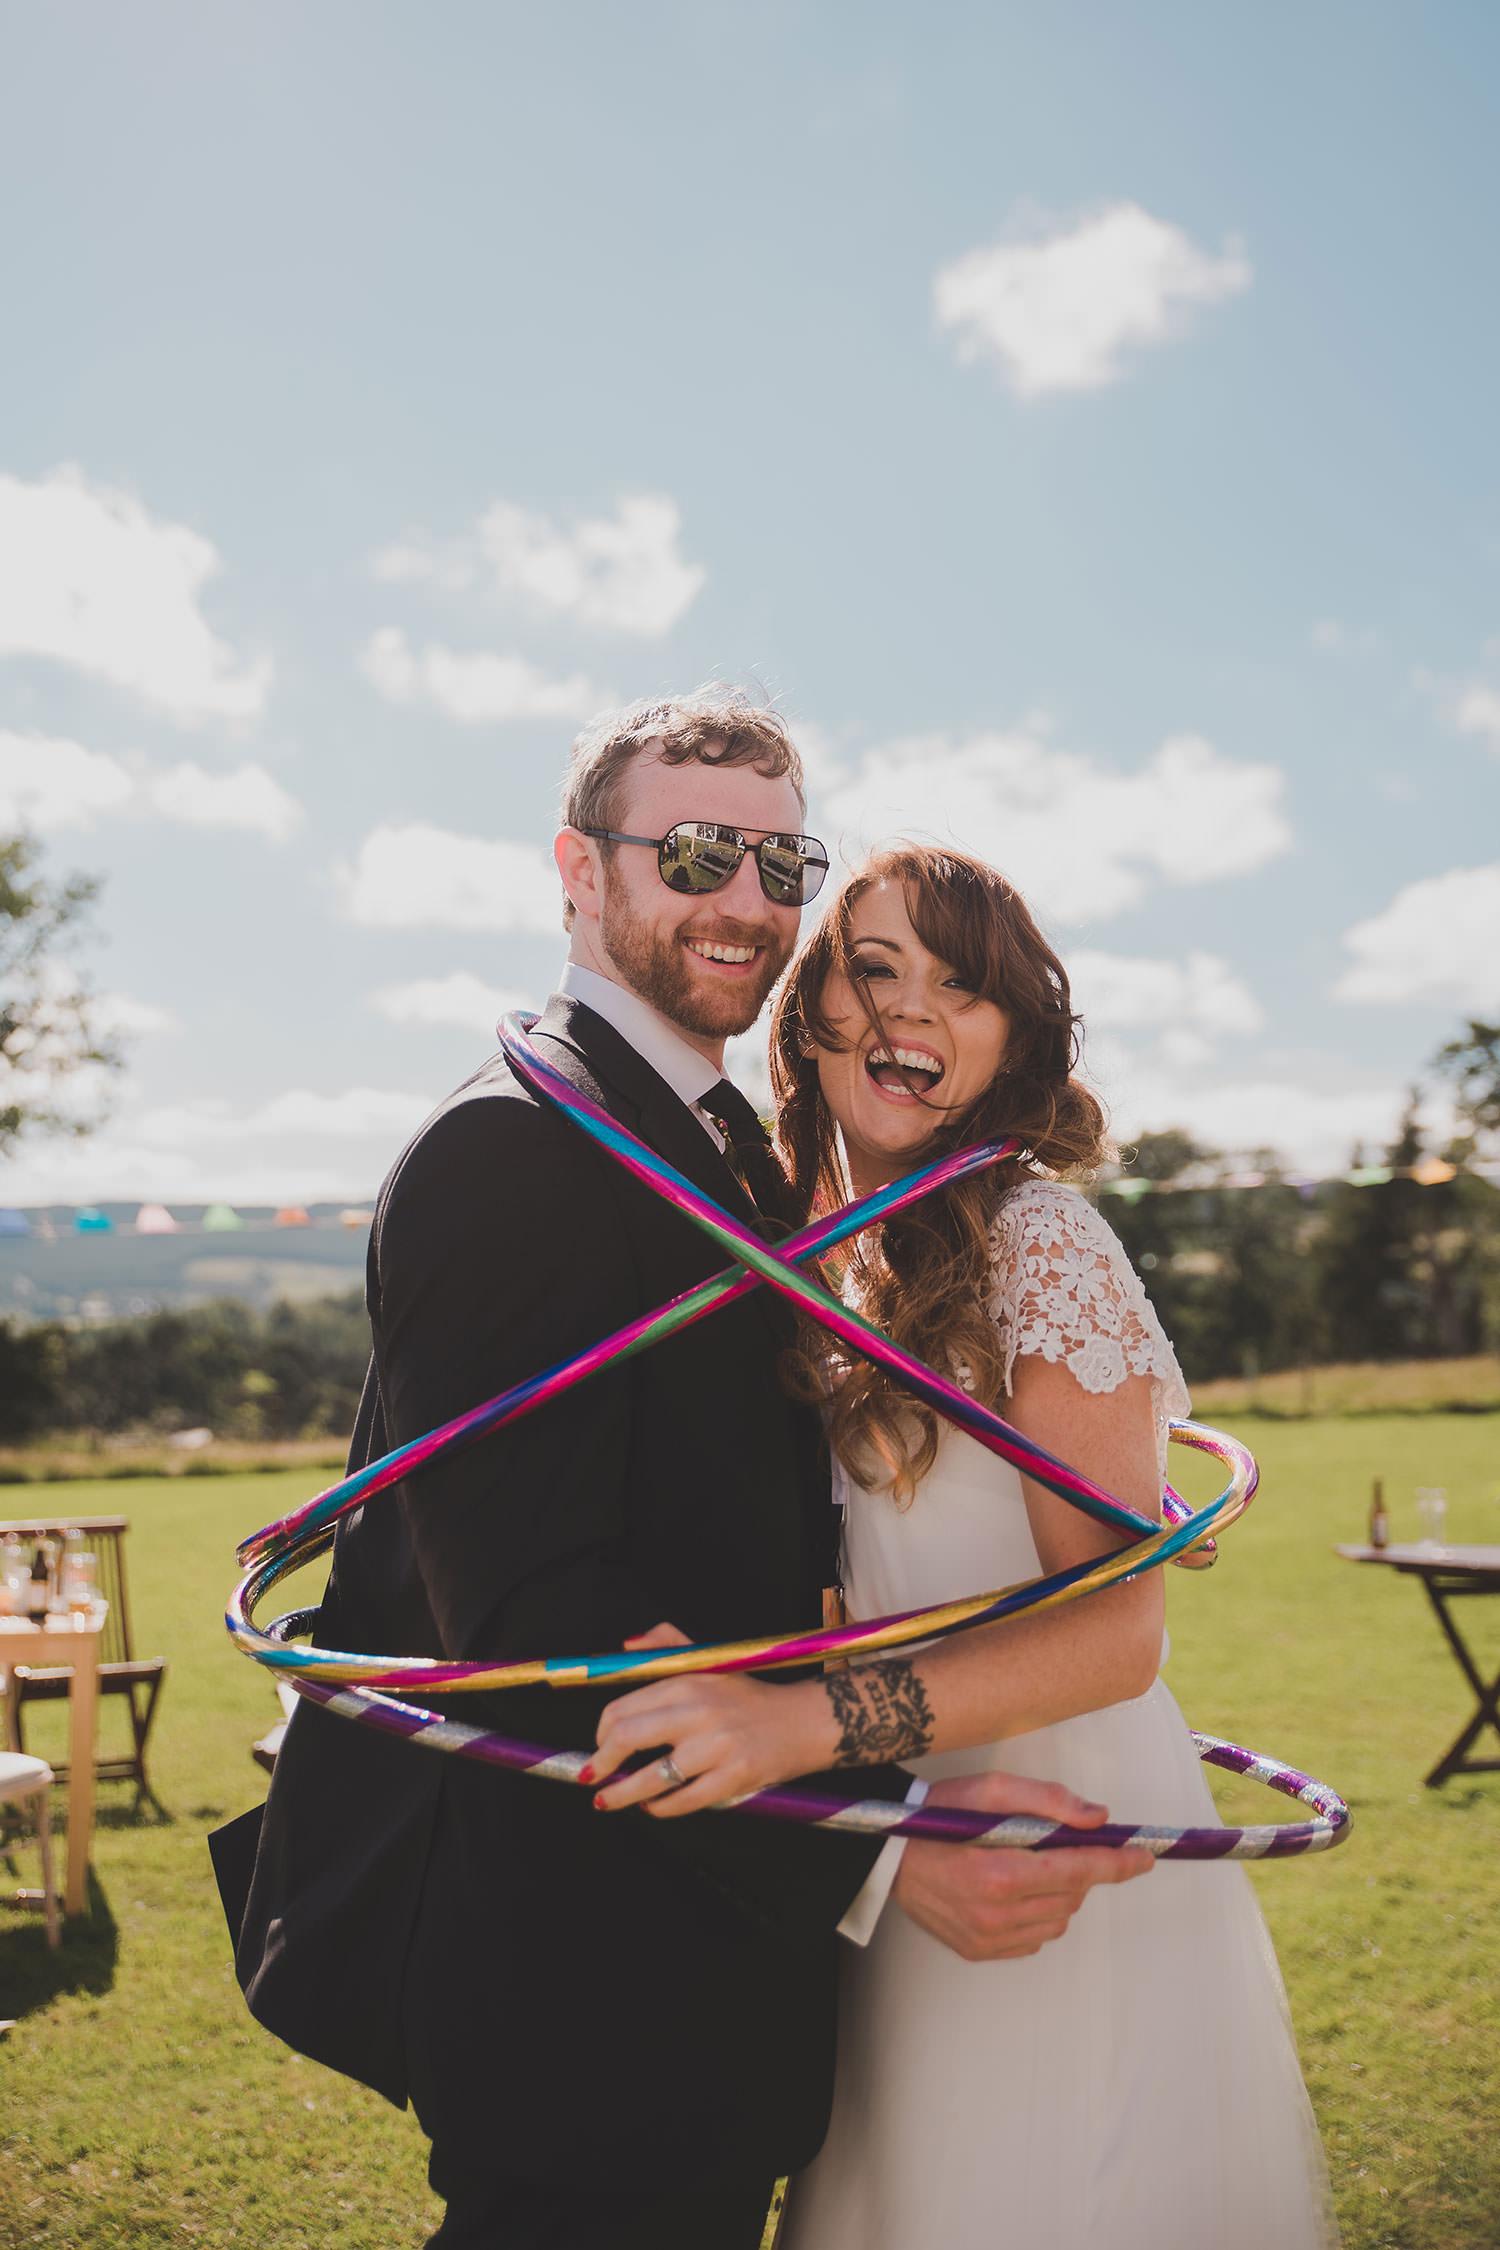 kippure-estate-wedding-photography-163.jpg